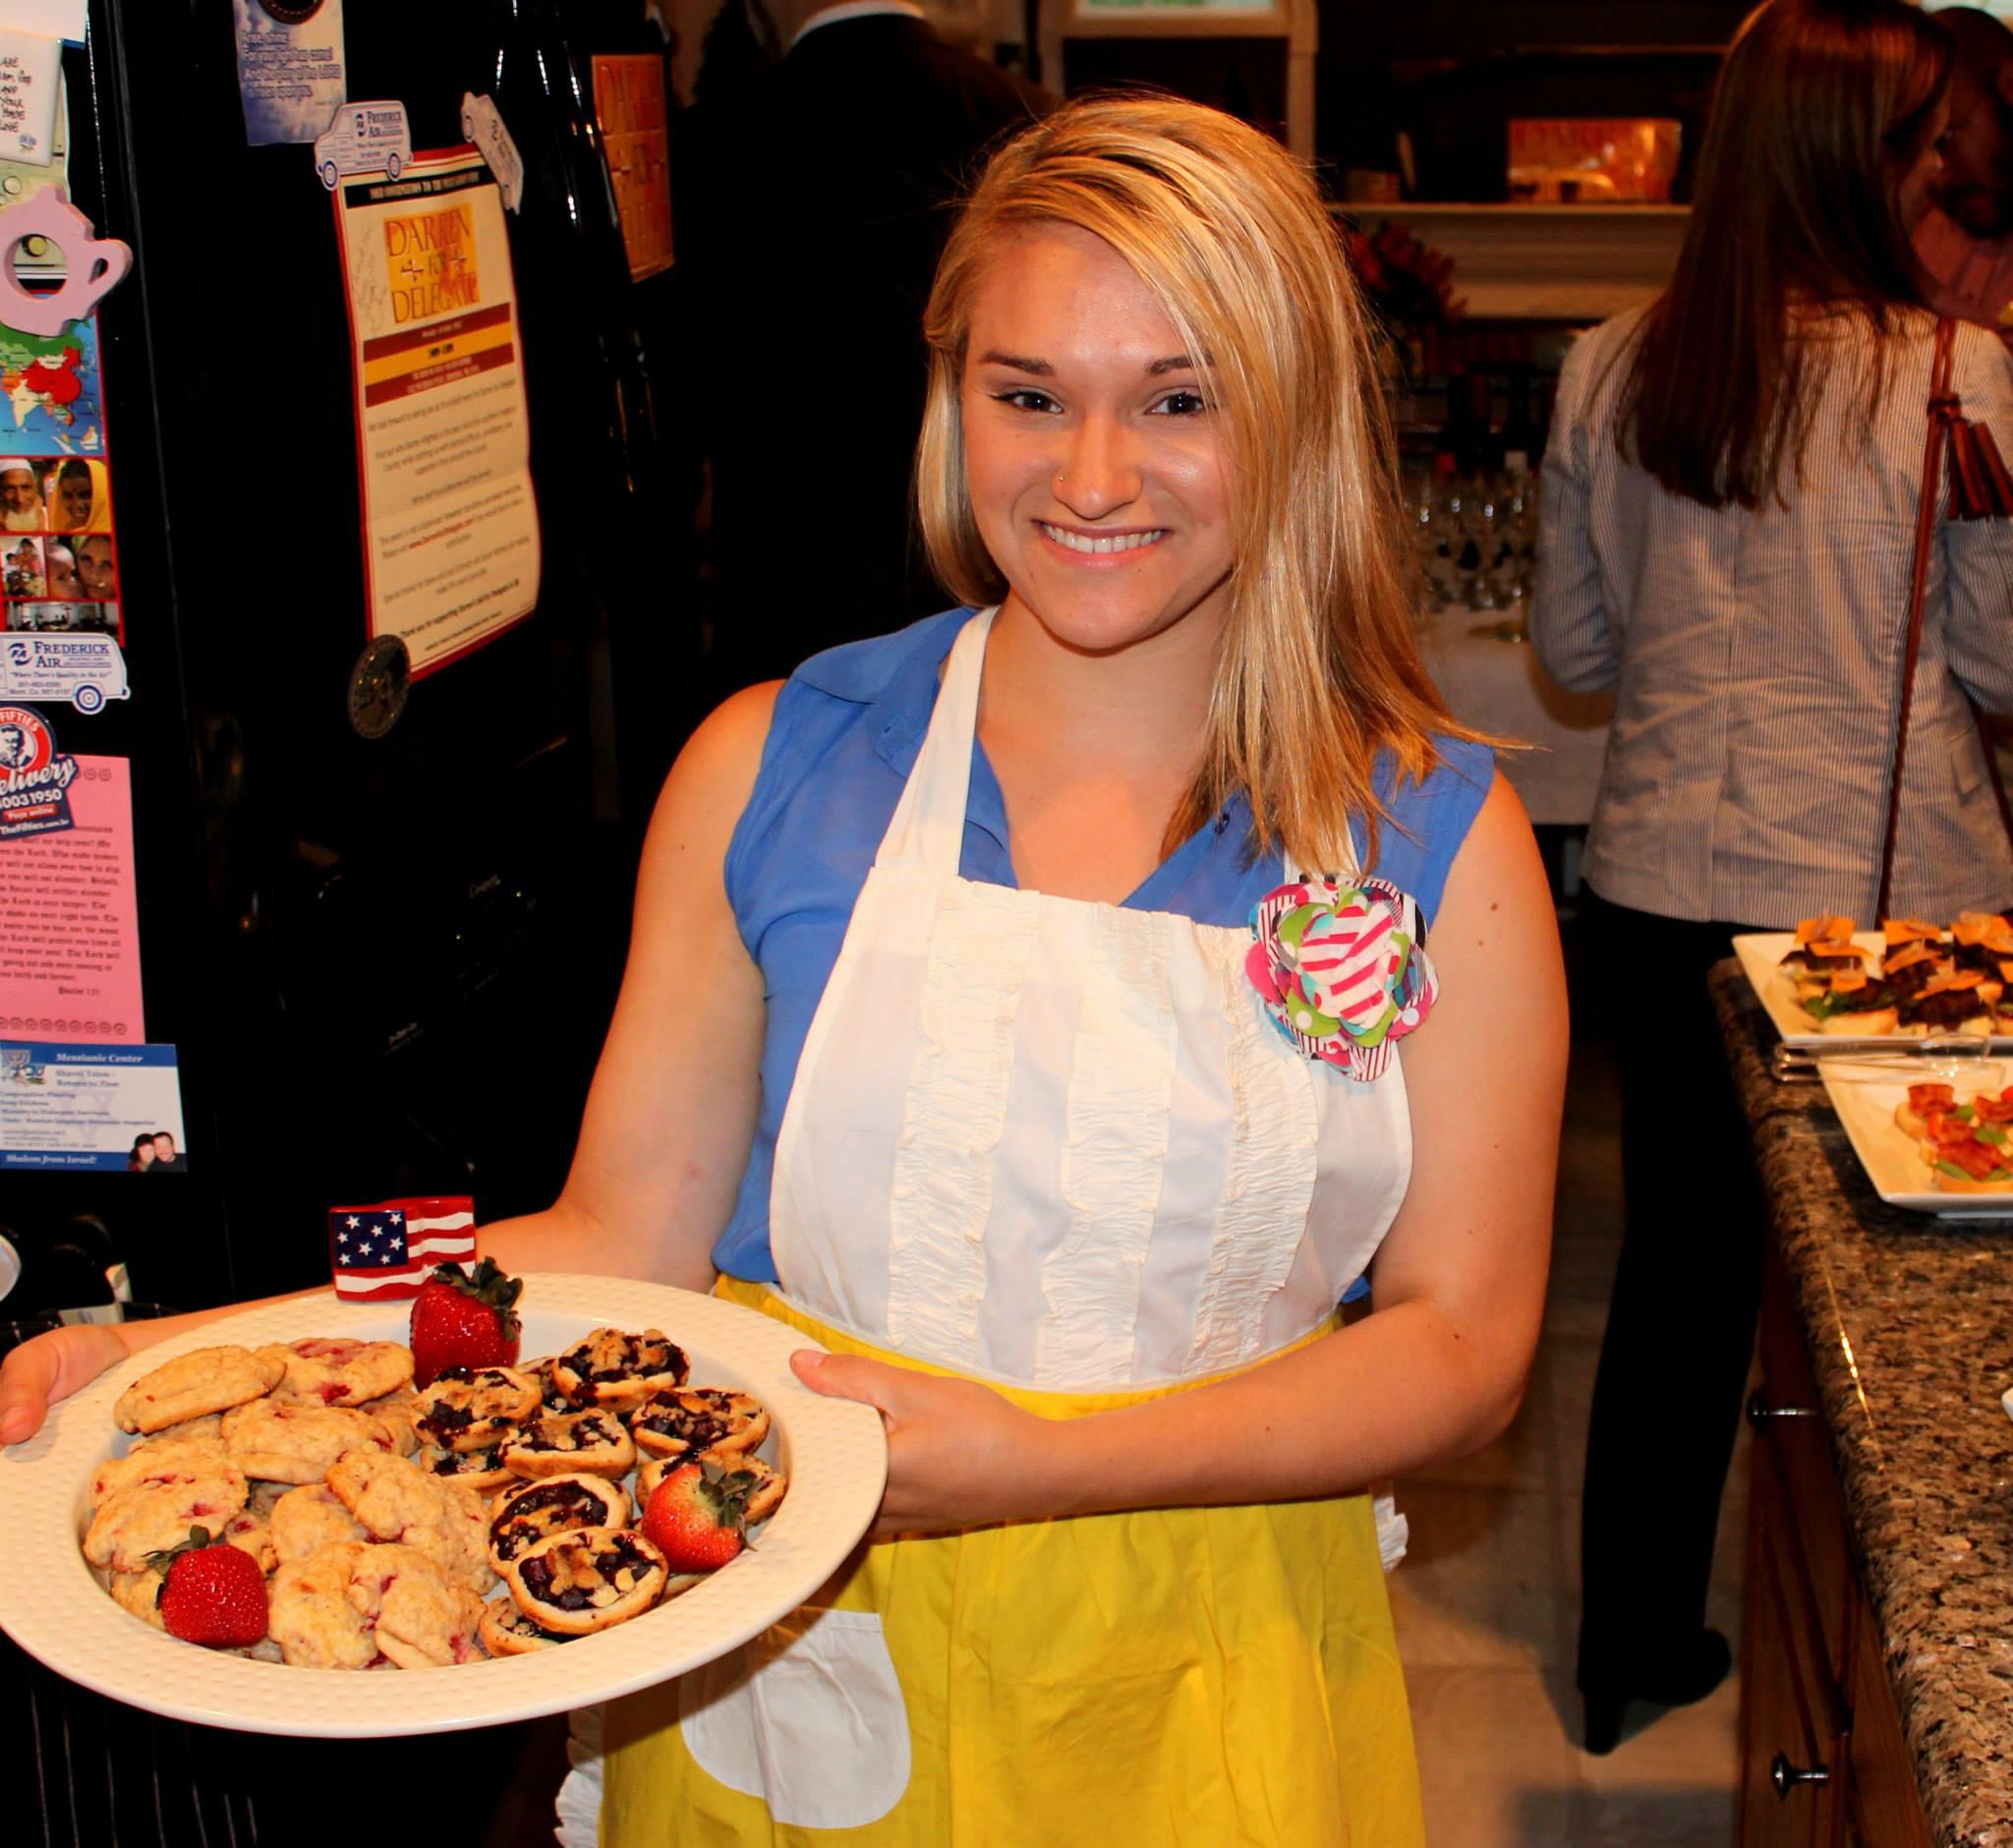 Sarah in a cute apron